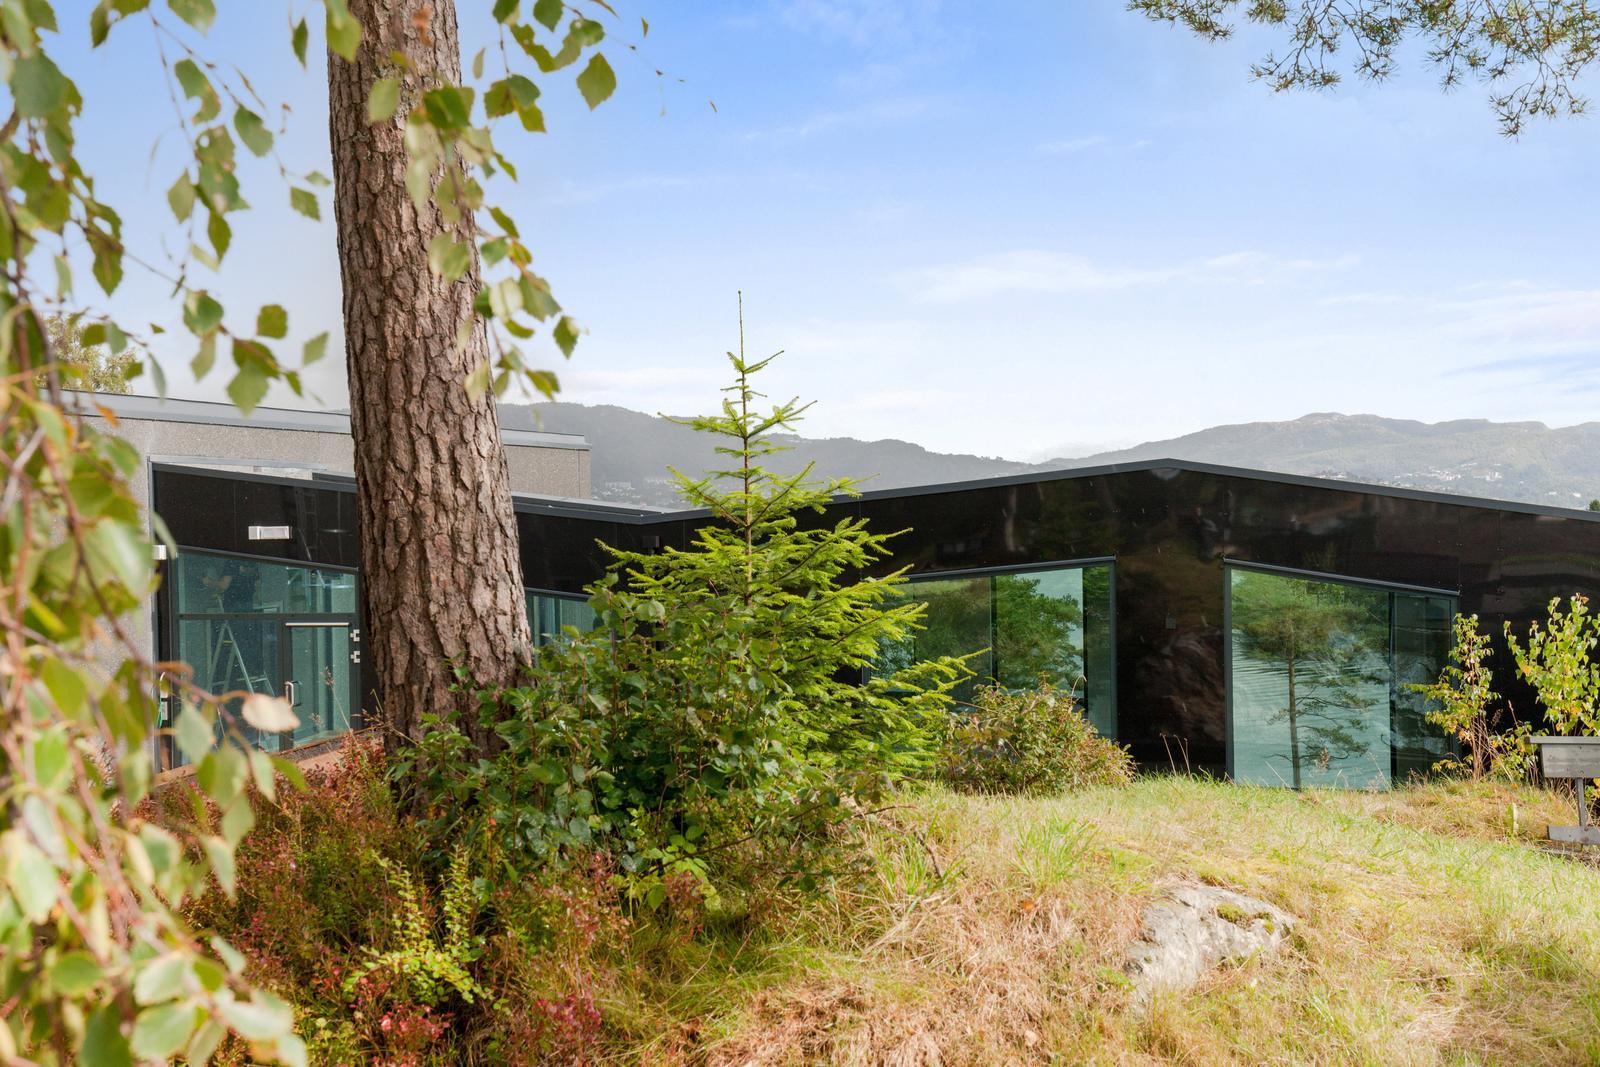 Helse Bergen Distriktspsykiatriske senter fasade